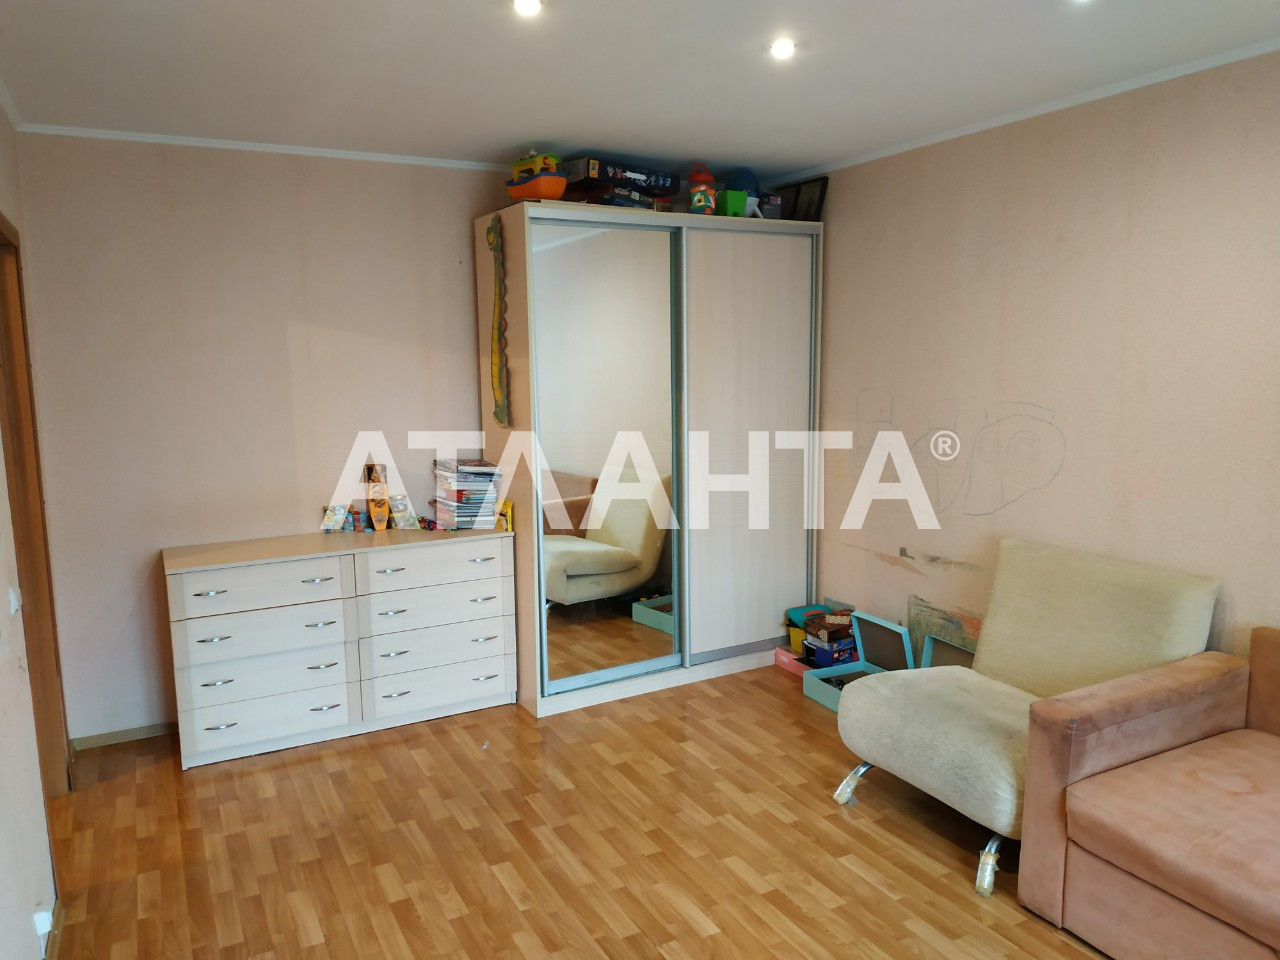 Продается 1-комнатная Квартира на ул. Ул. Героев Днепра — 42 000 у.е. (фото №2)